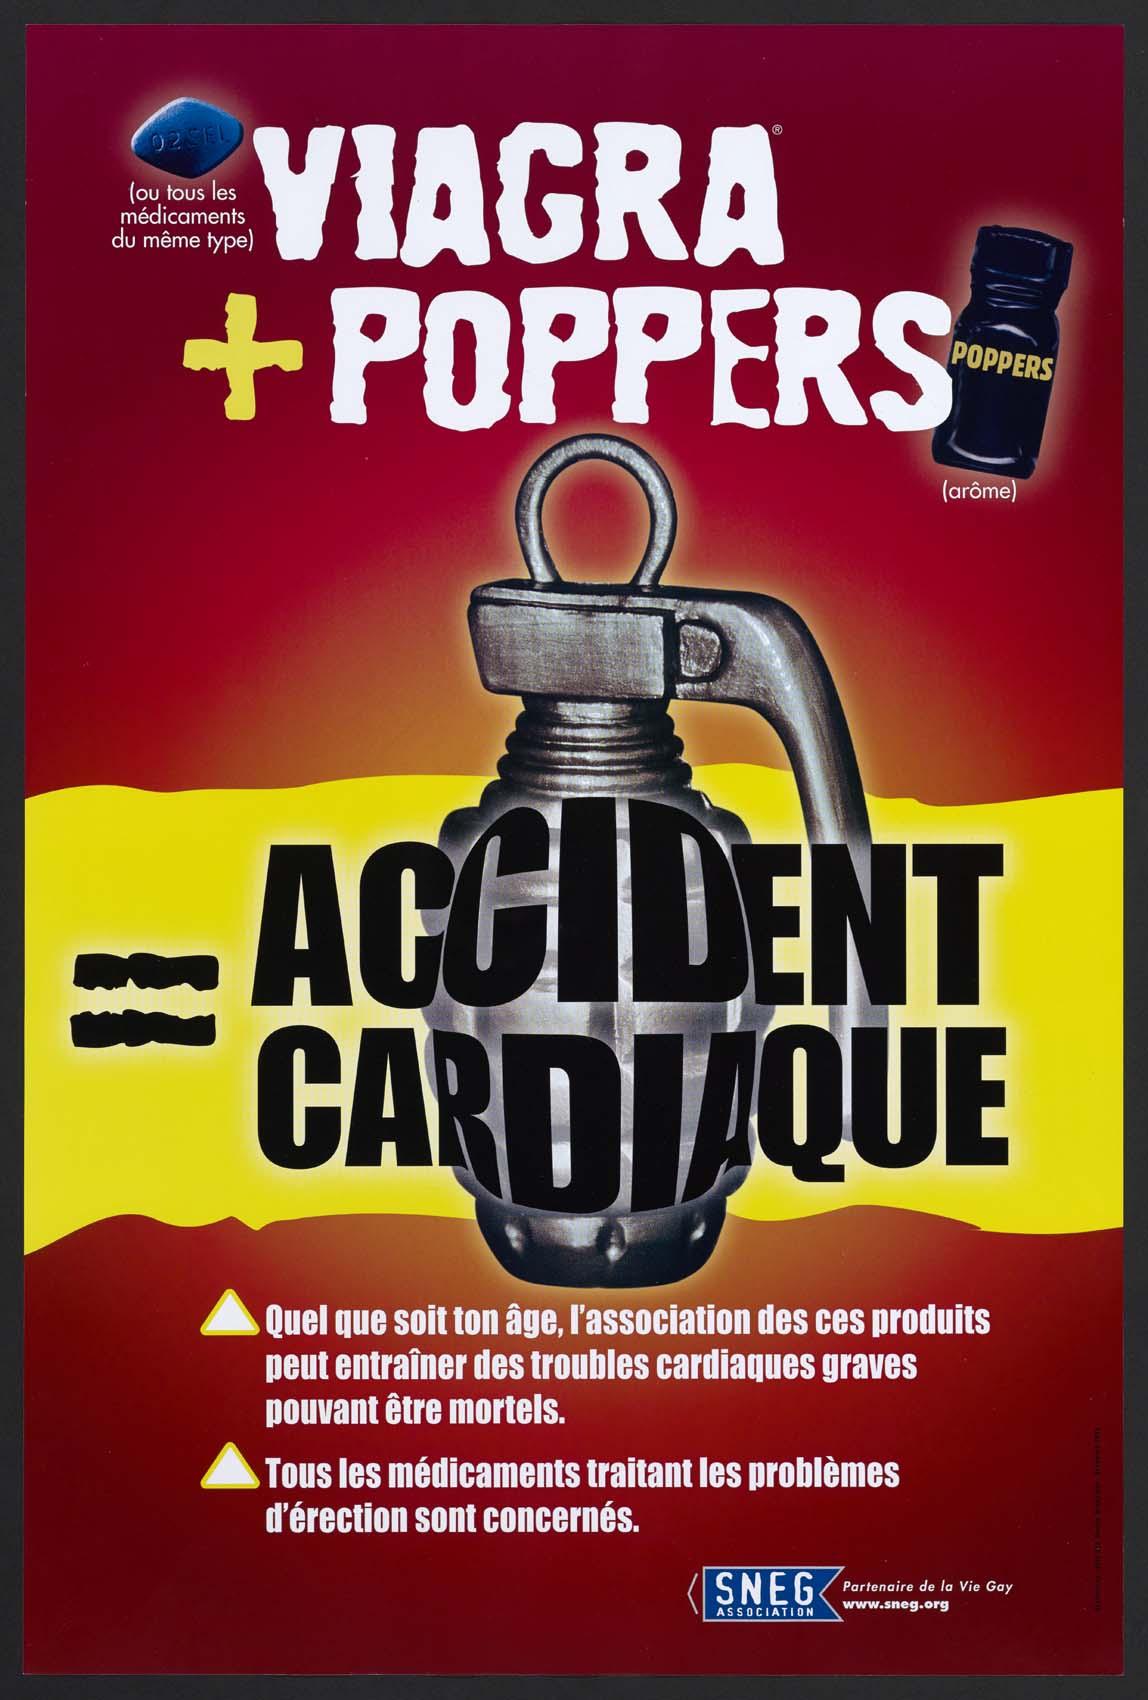 Viagra Poppers